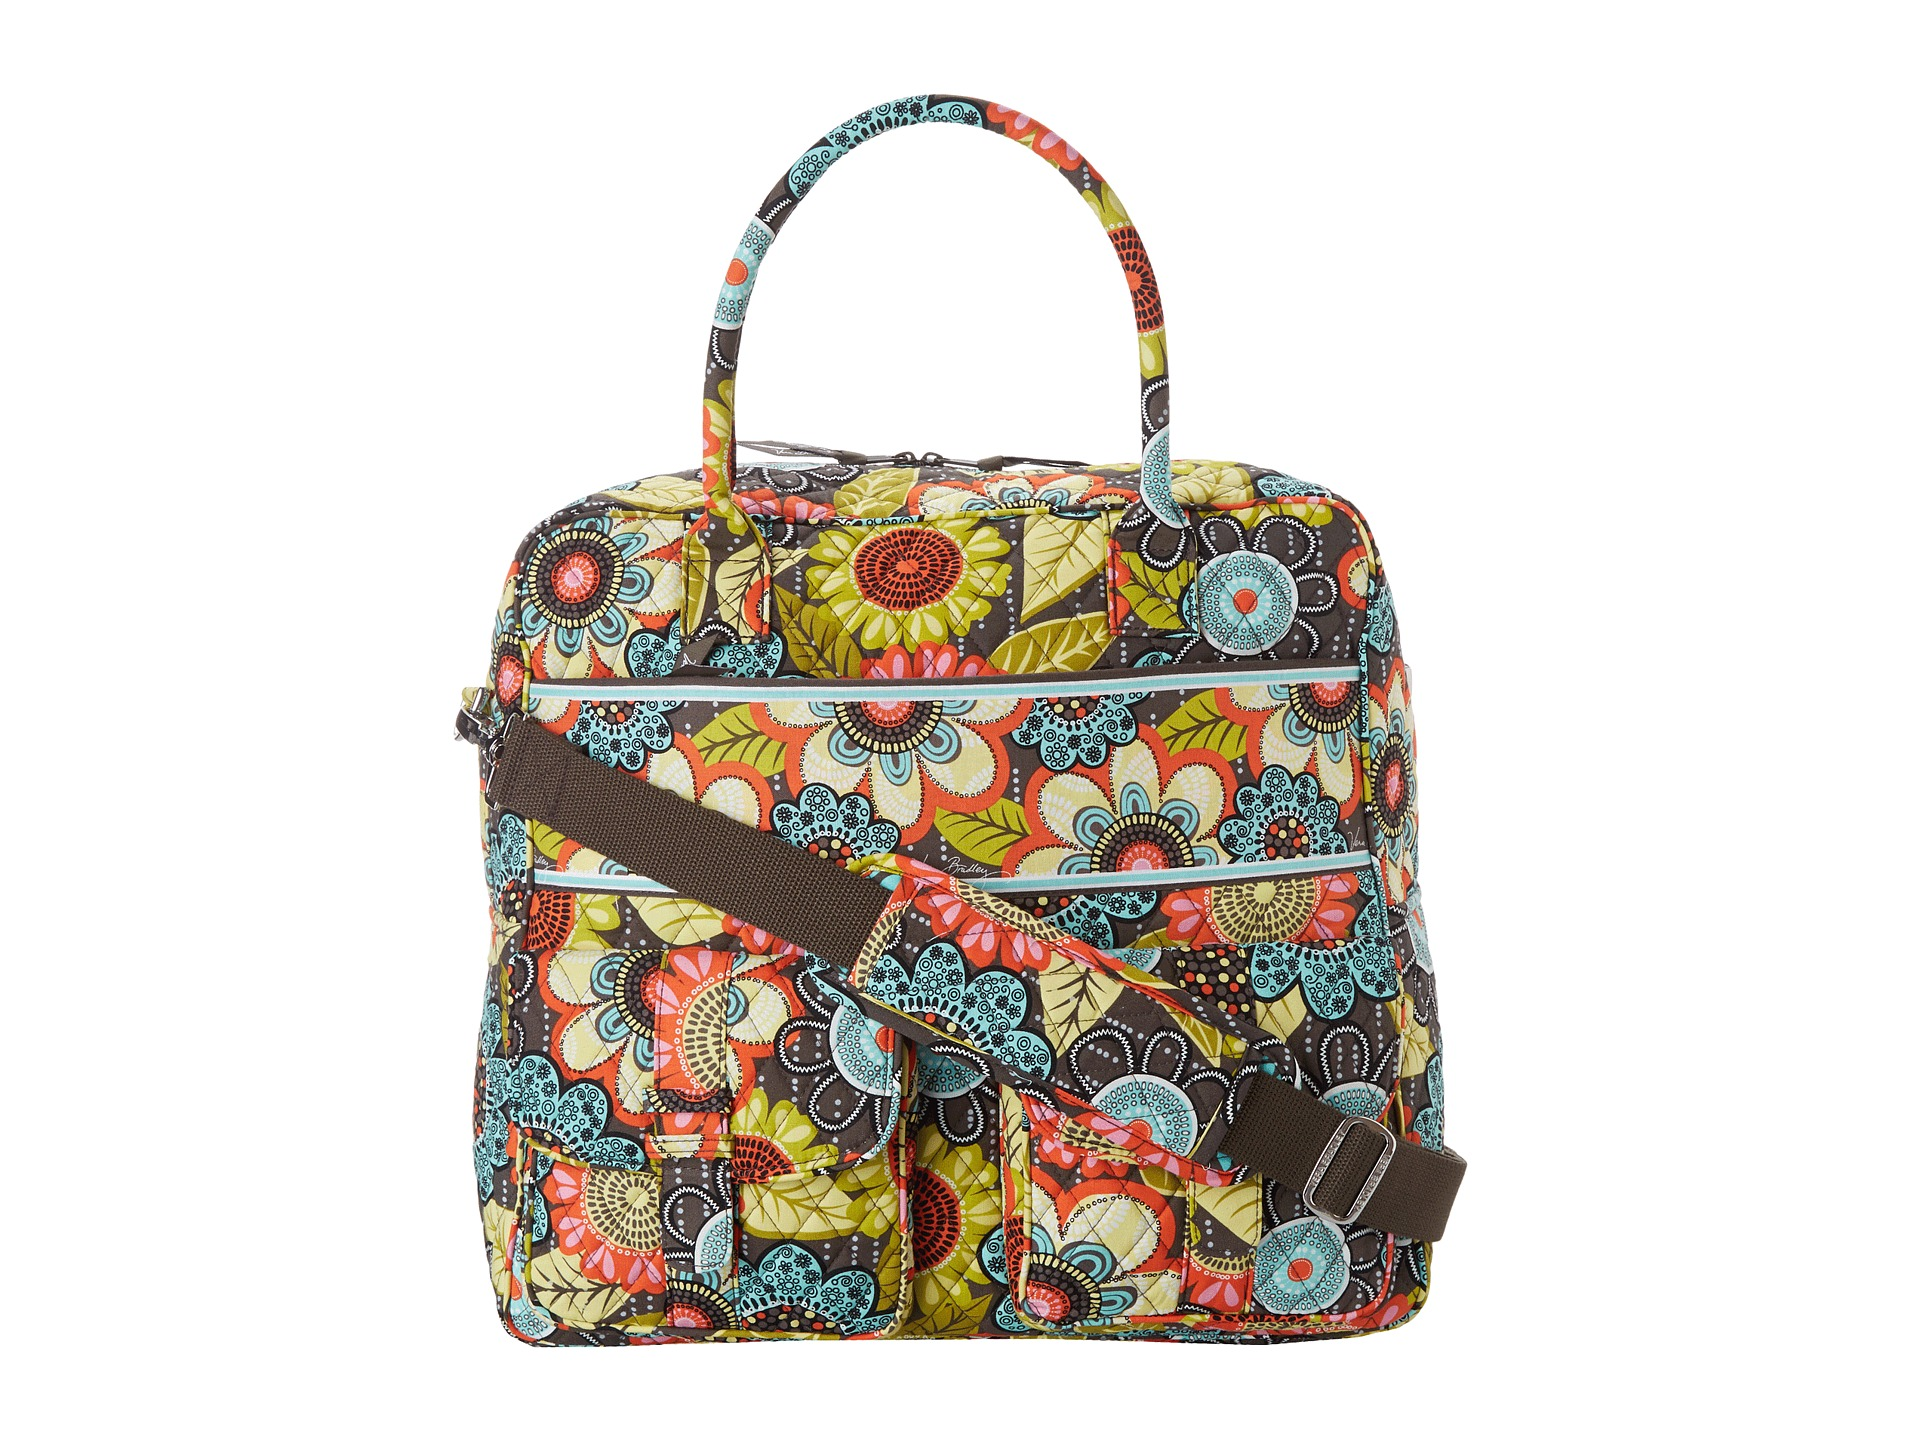 Vera bradley luggage grand cargo bag flower shower for Vera bradley bathroom bag